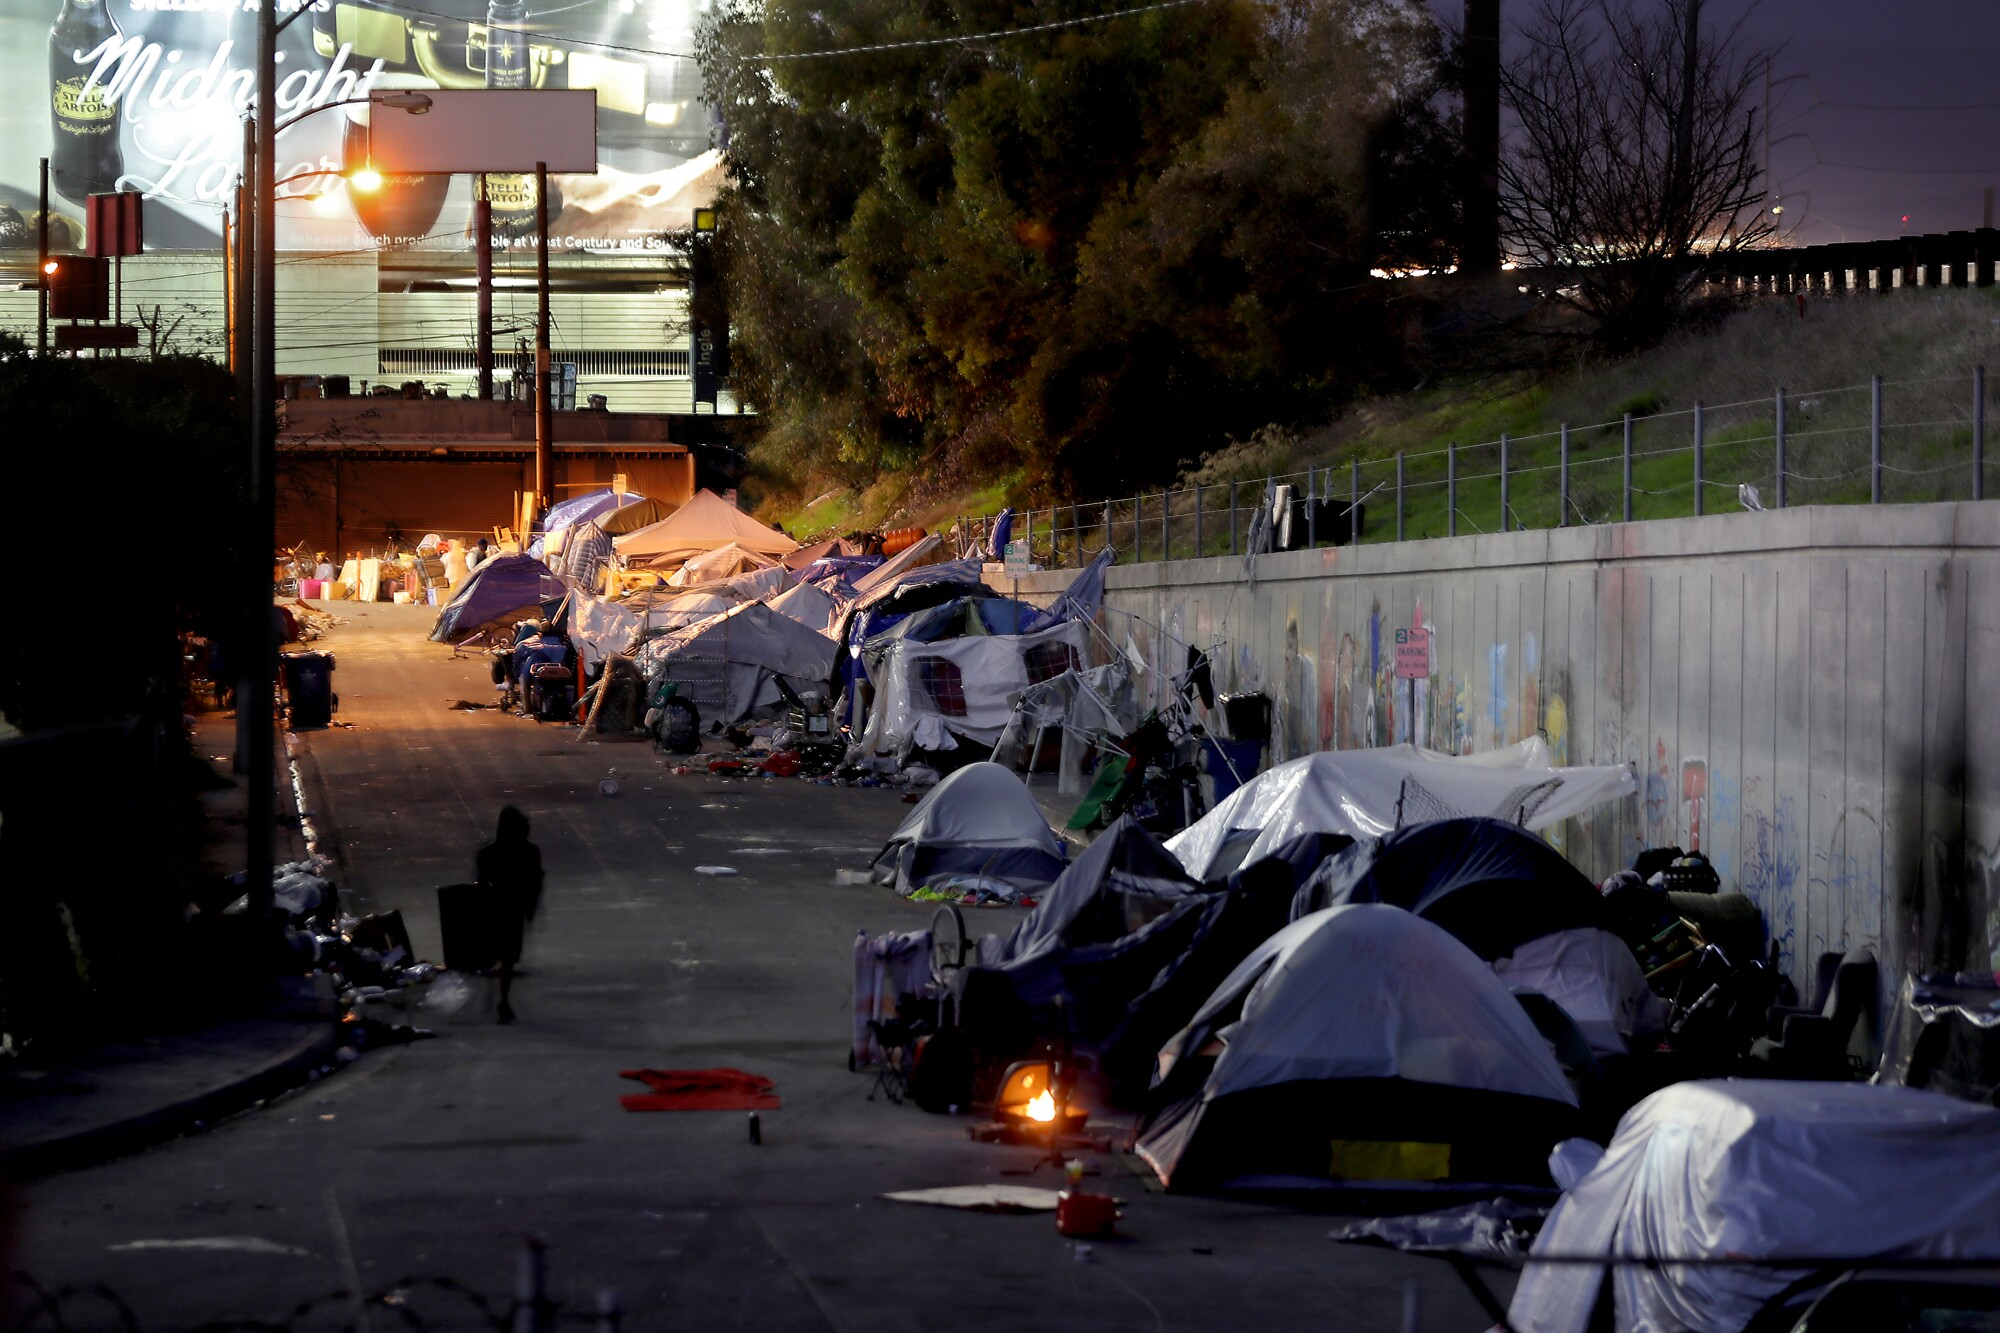 A homeless encampment near Los Angeles International Airport.